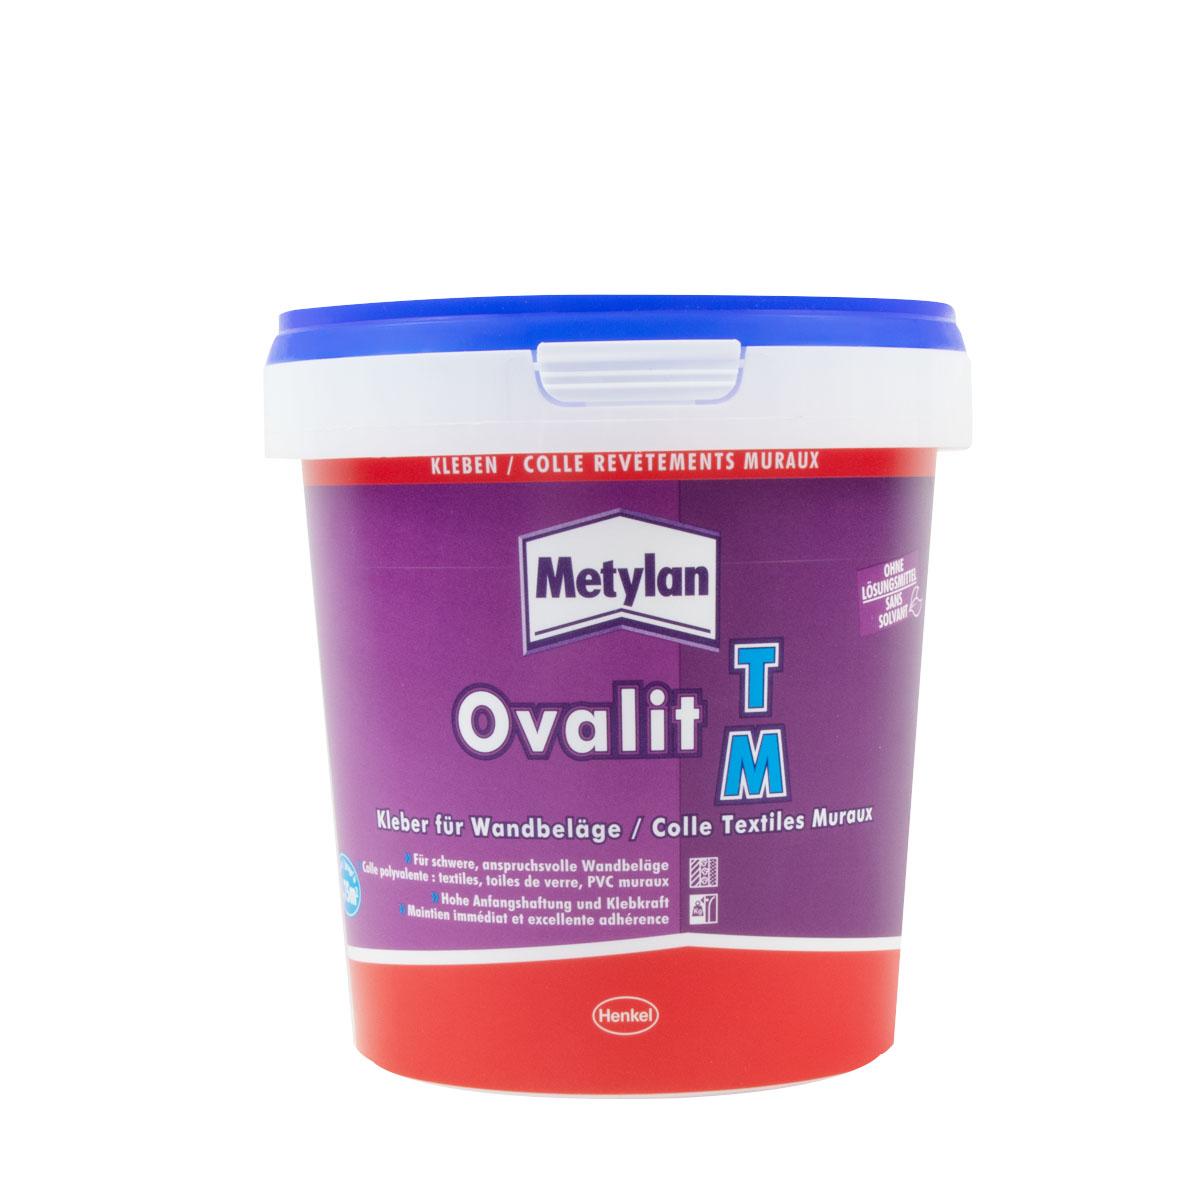 Metylan Ovalit TM Kleber 750g ,Kleber für Wandbeläge